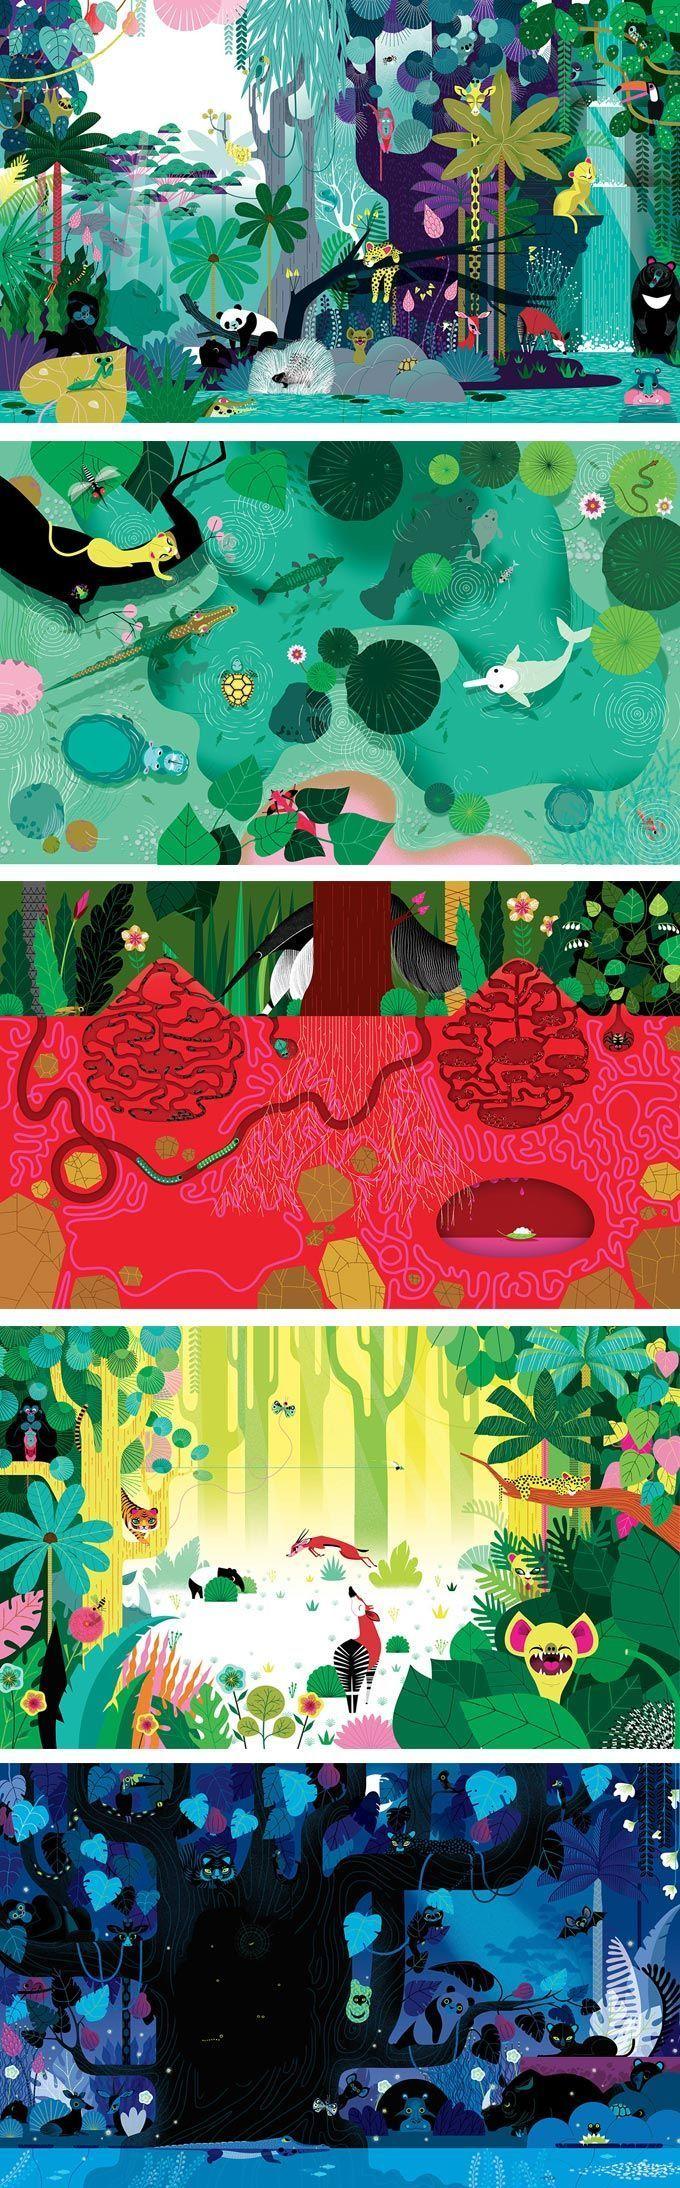 Lucie Brunellière // illustration // jungle illustration